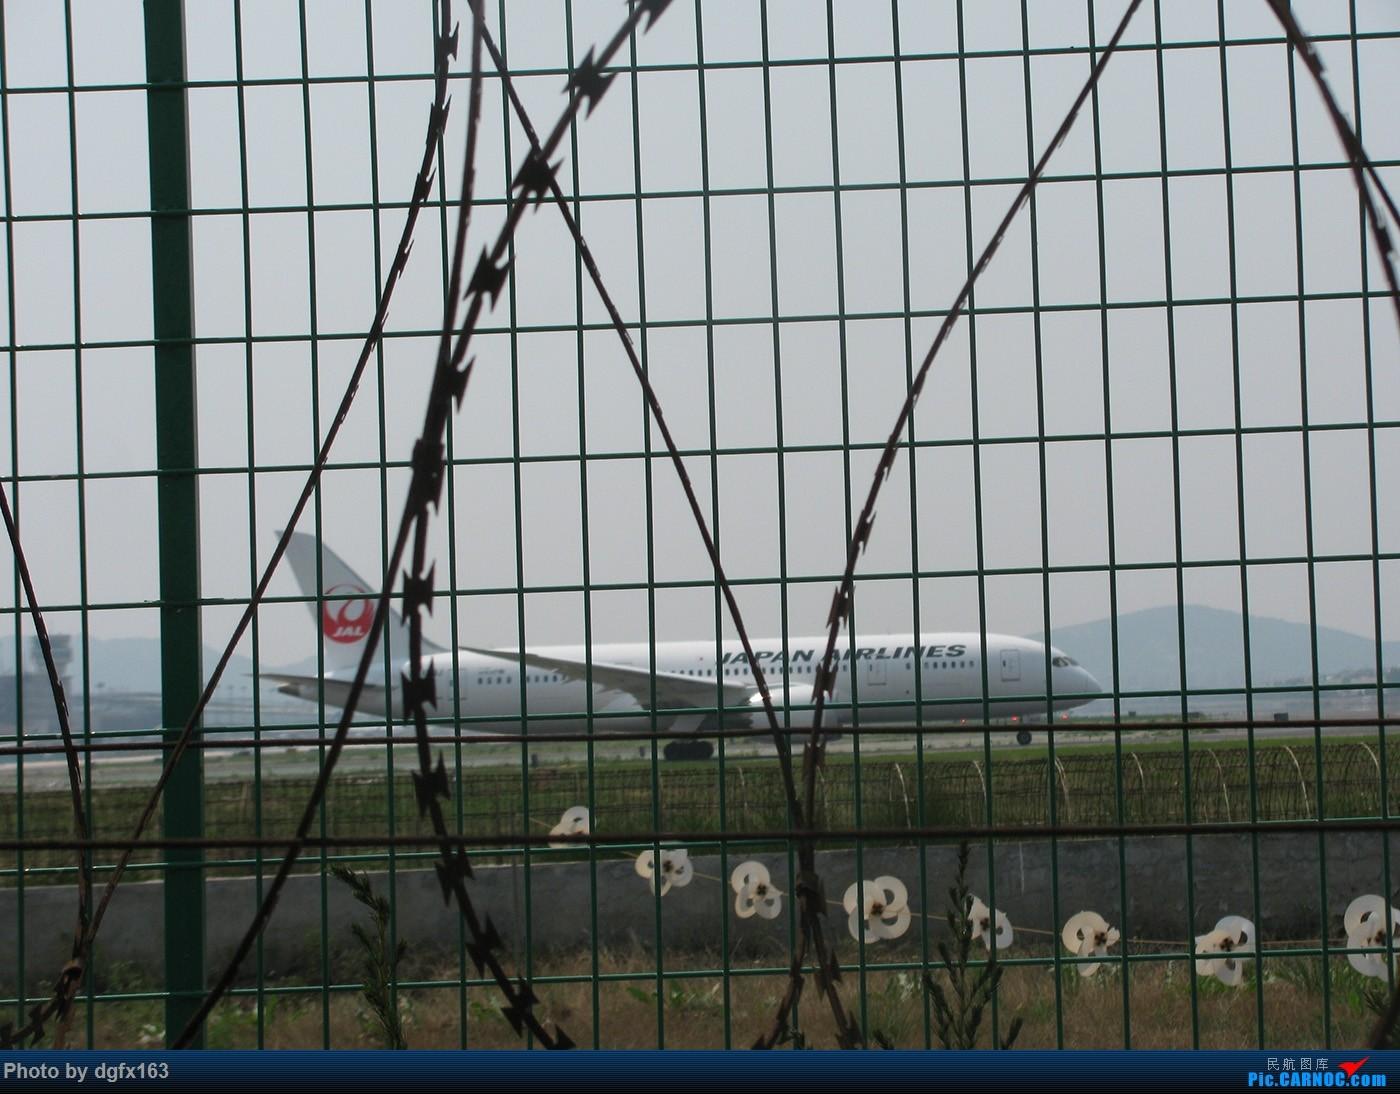 Re:[原创]【dgfx163的拍机(1)大连周水子DLC,烈日拍机1小时半。全日空、日本航空、大韩。。。还不错 BOEING 787-8 JA829J 中国大连周水子国际机场